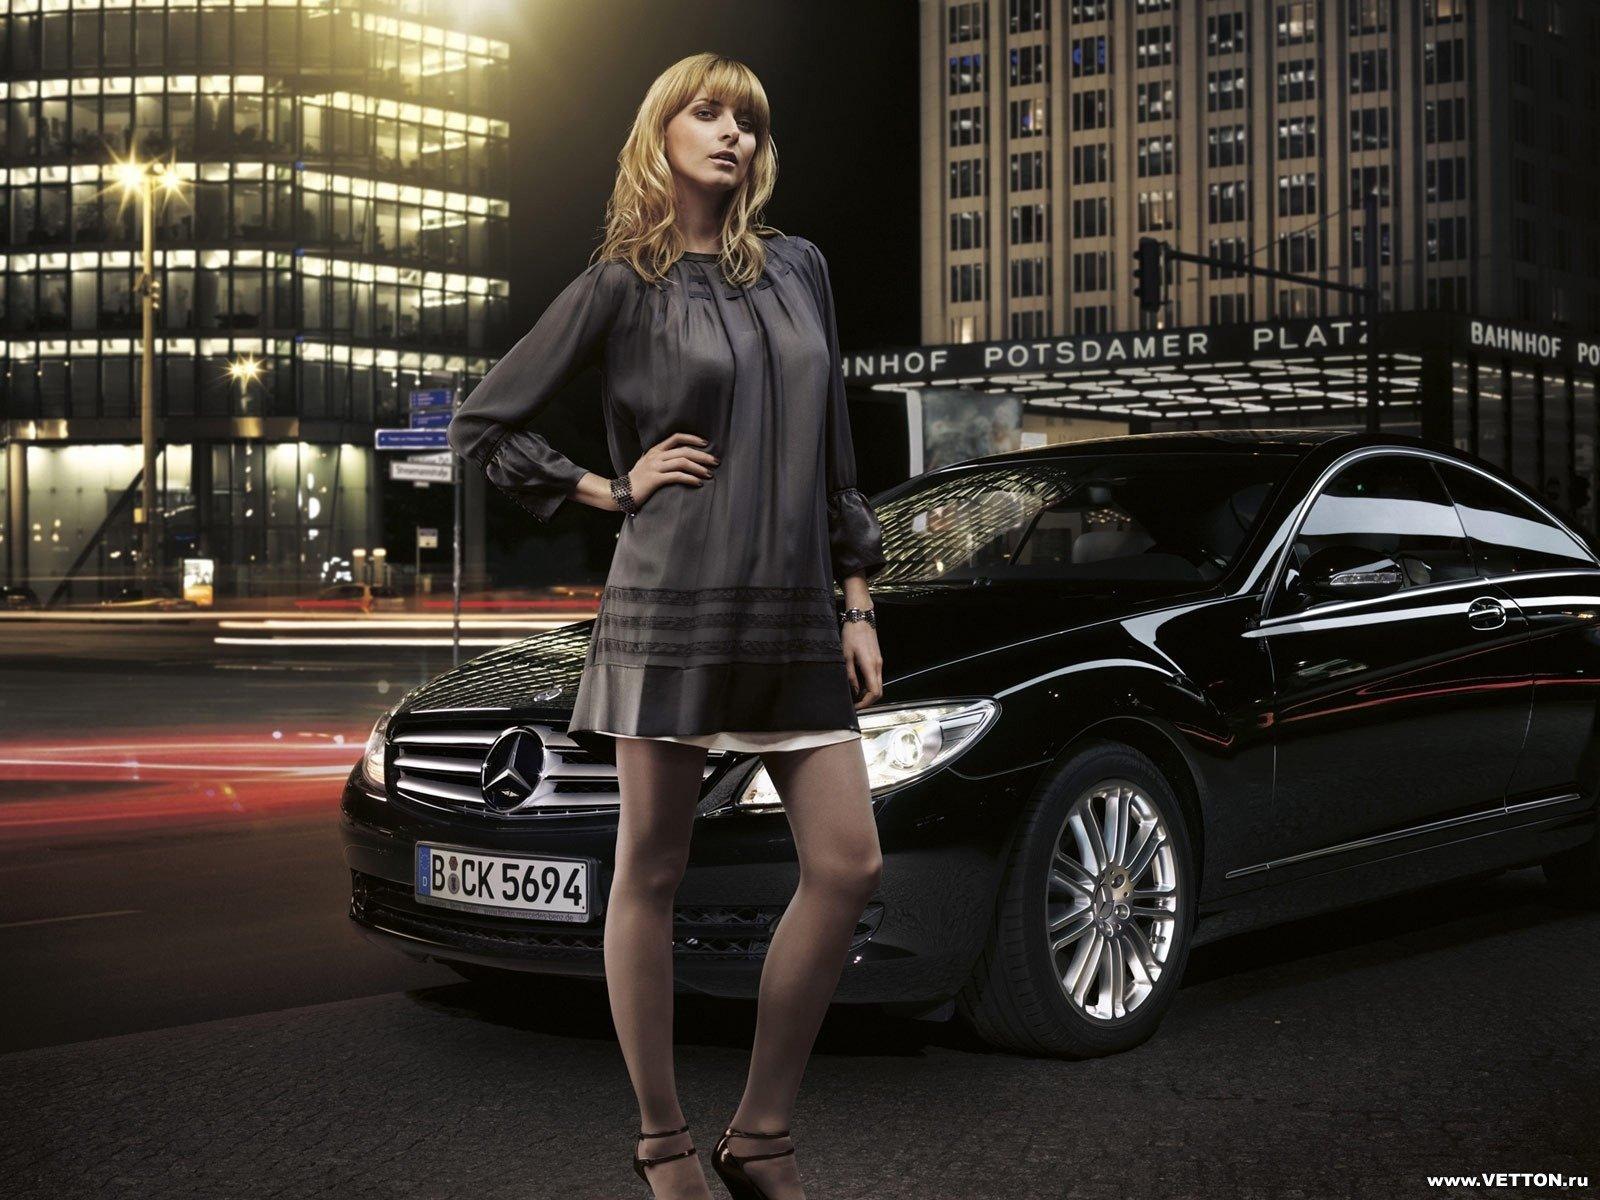 Vehicles - Mercedes-Benz  Wallpaper